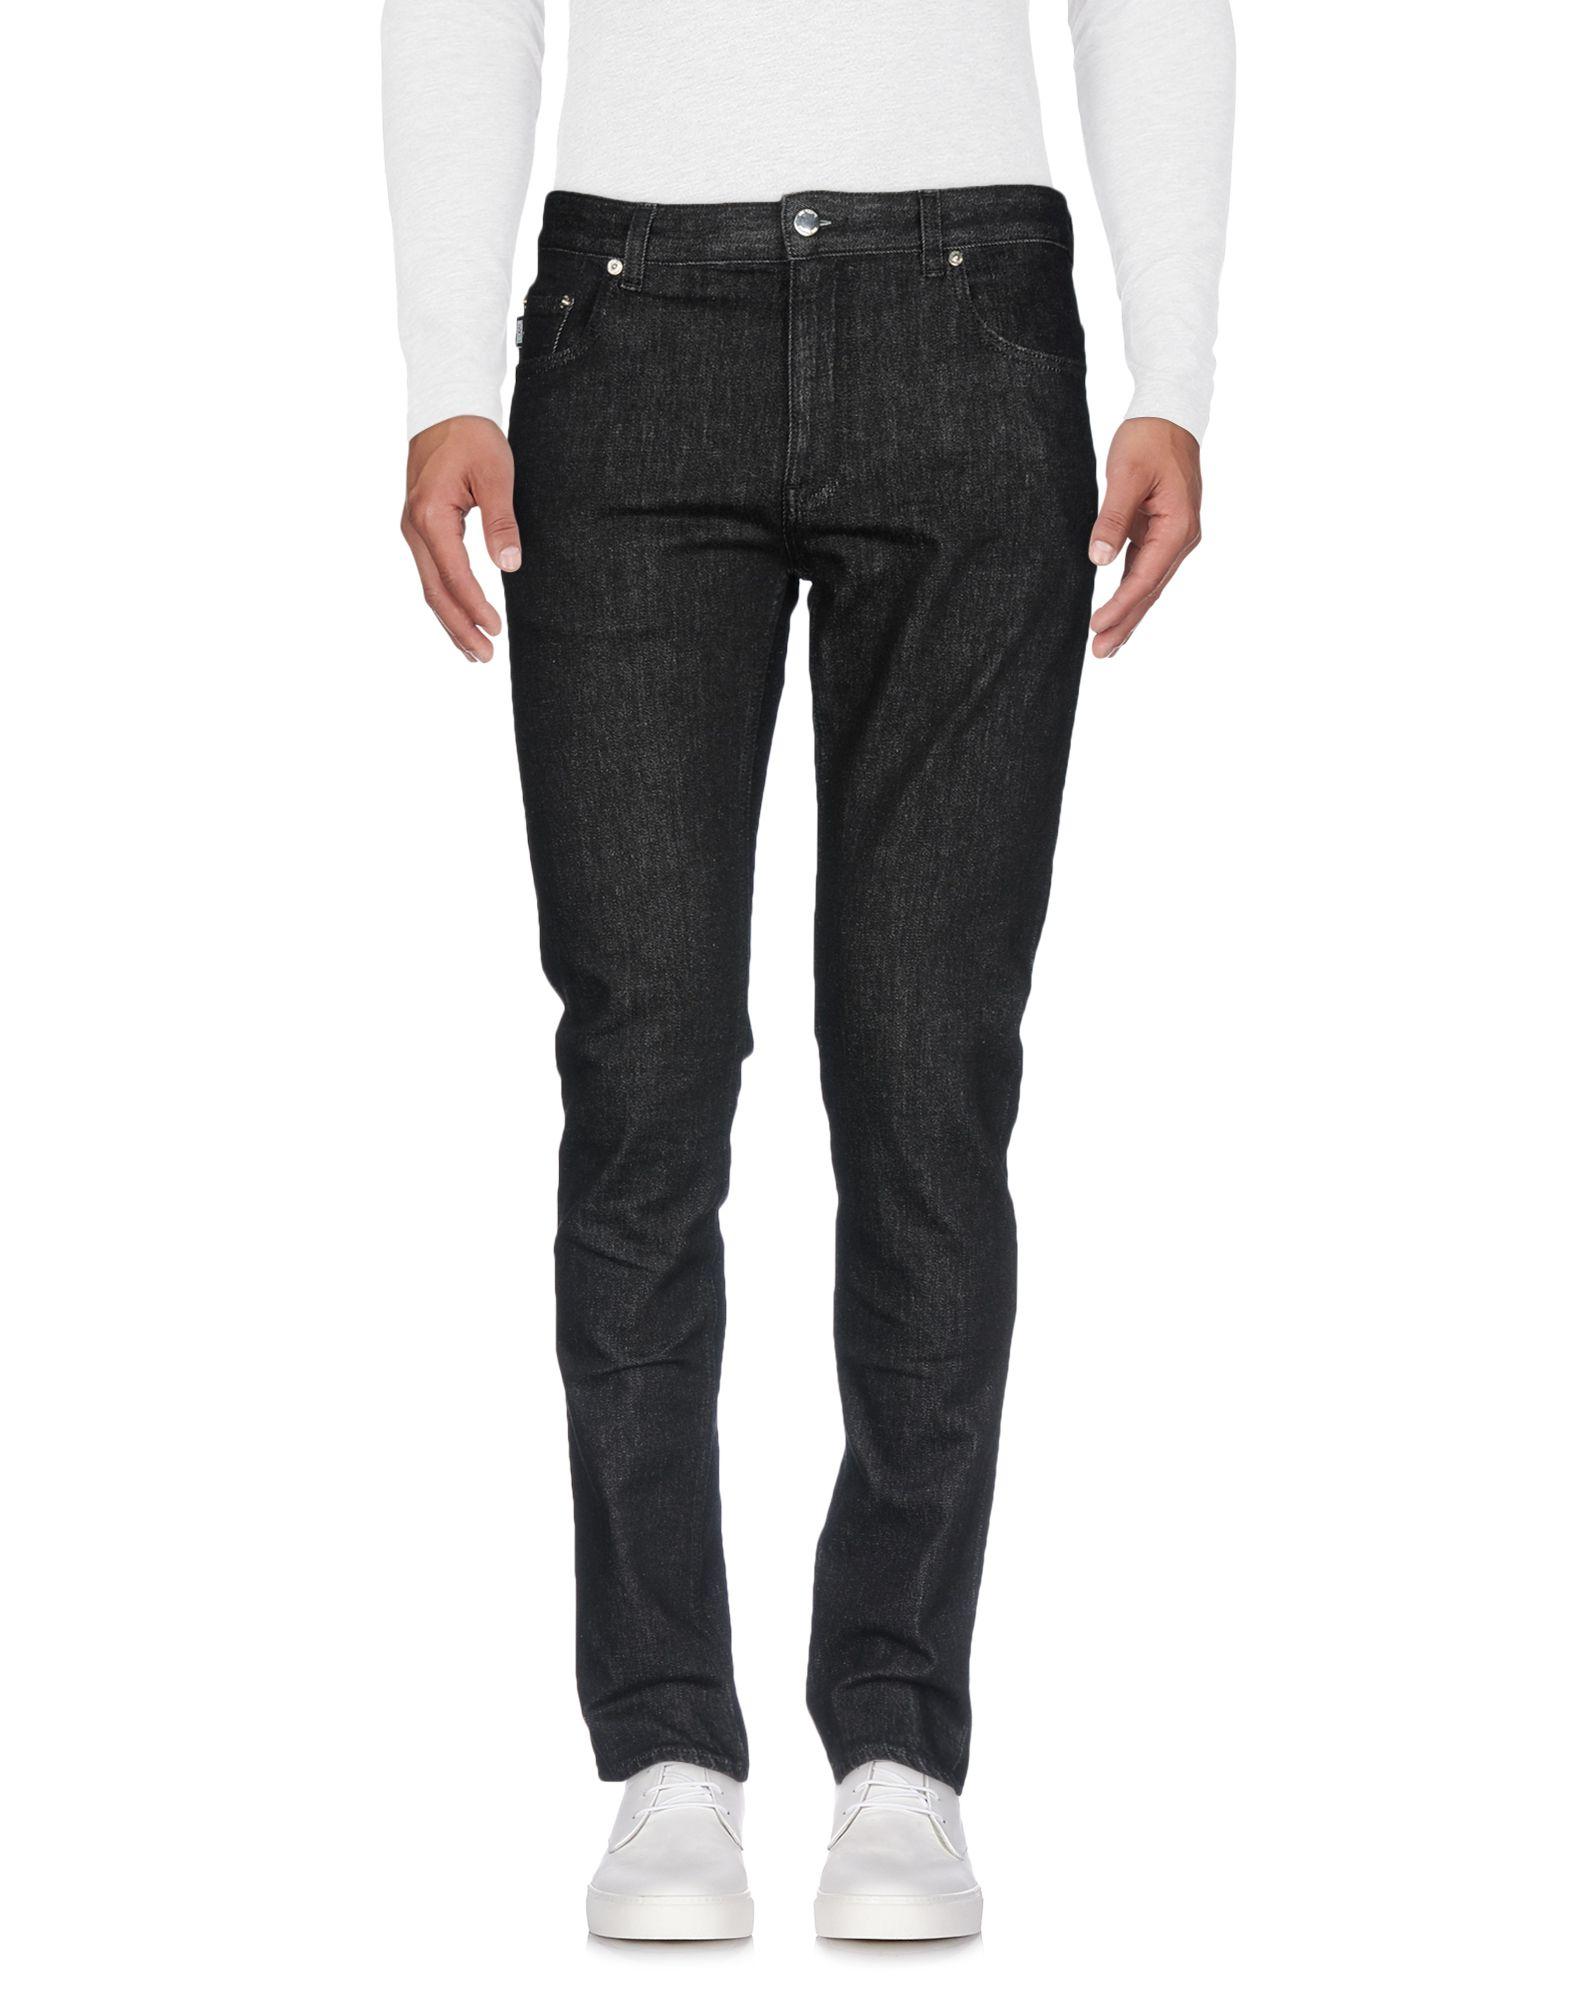 Pantaloni Jeans Love Moschino Uomo - 42666719LM 42666719LM 42666719LM 1b1893